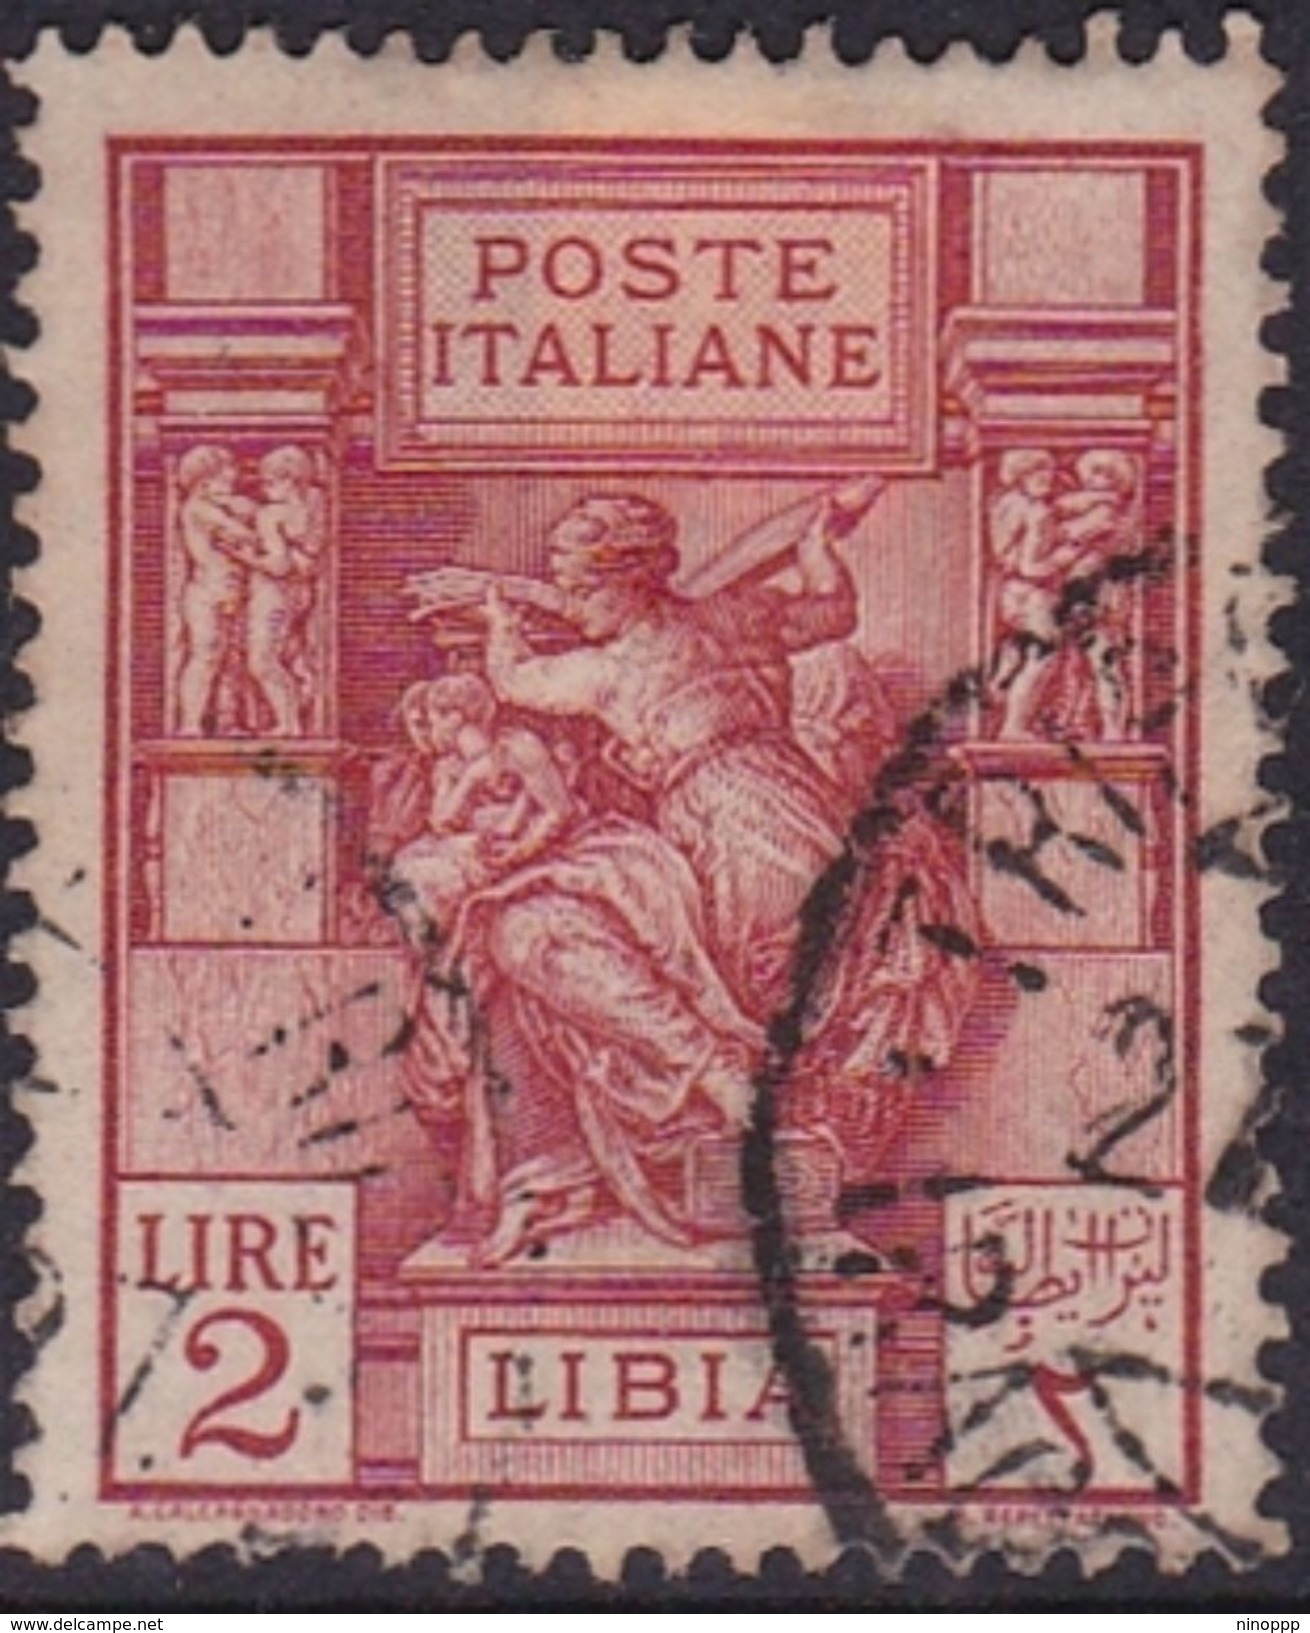 Italy-Colonies And Territories-Libya S 43 1924 ,Libyan Sibyl,2 Lire Carmine,used - Libya